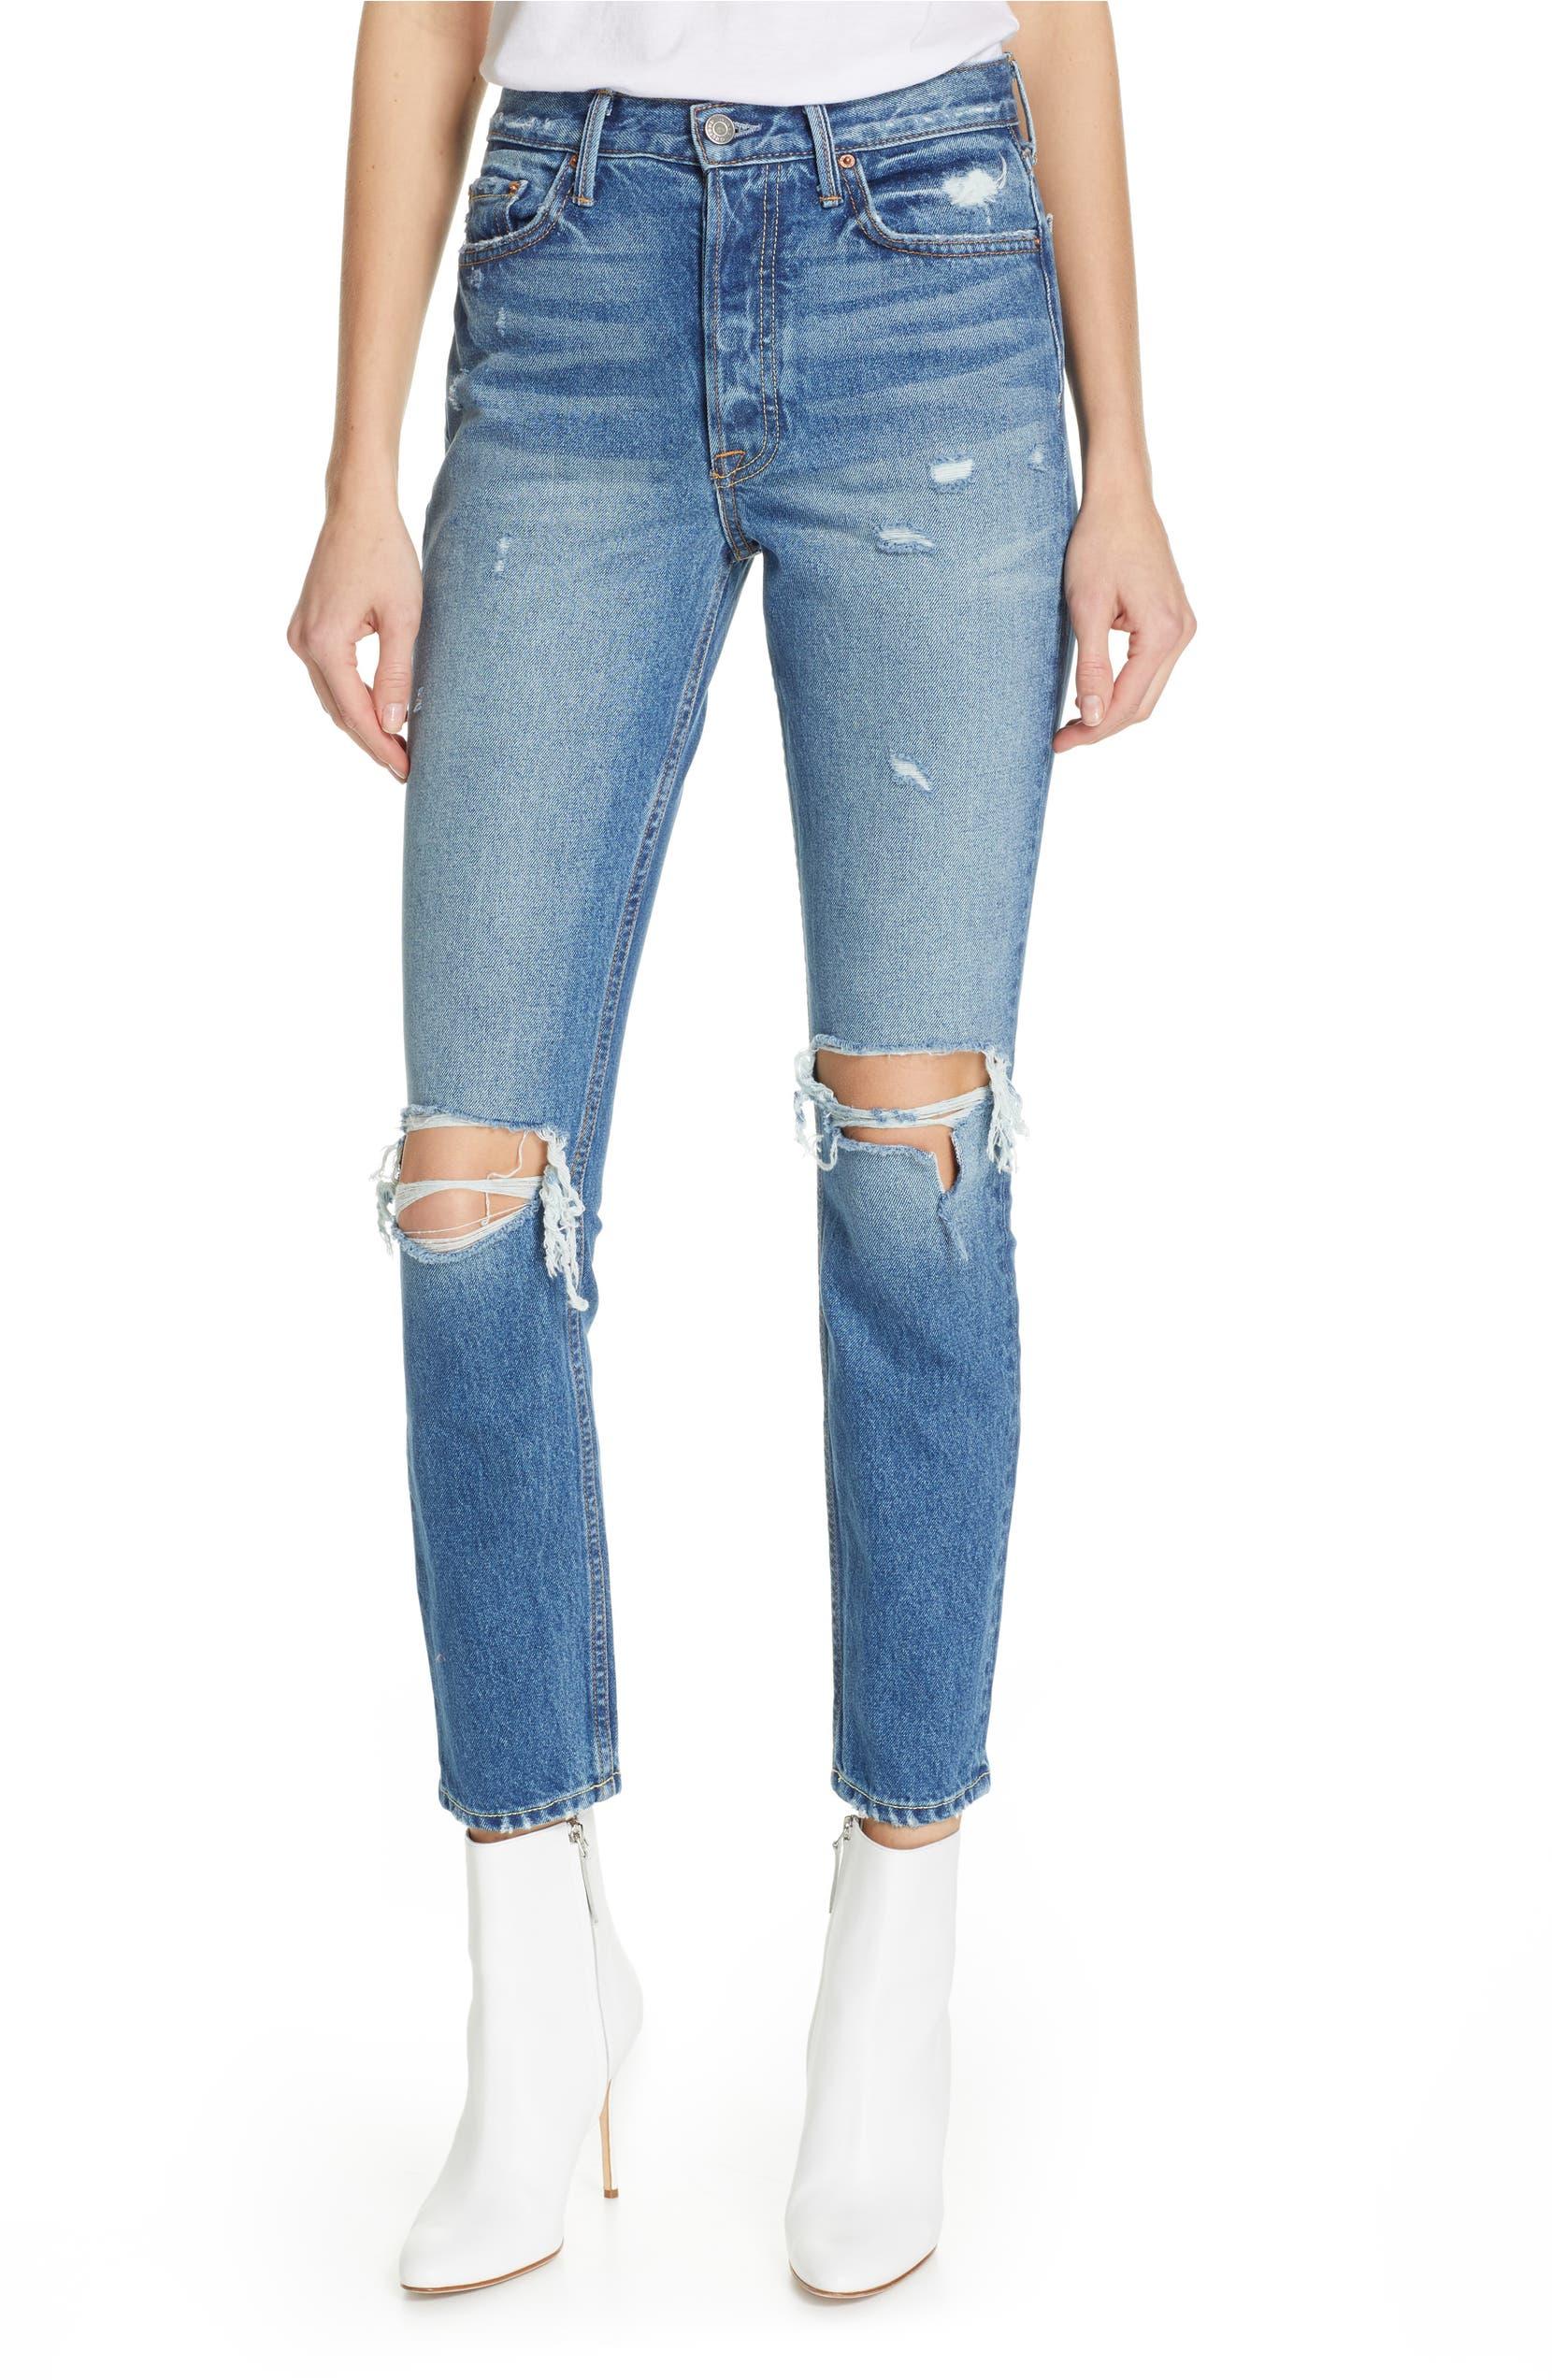 47b7dcbbed GRLFRND Karolina Ripped High Waist Skinny Jeans (I Put a Spell On You)